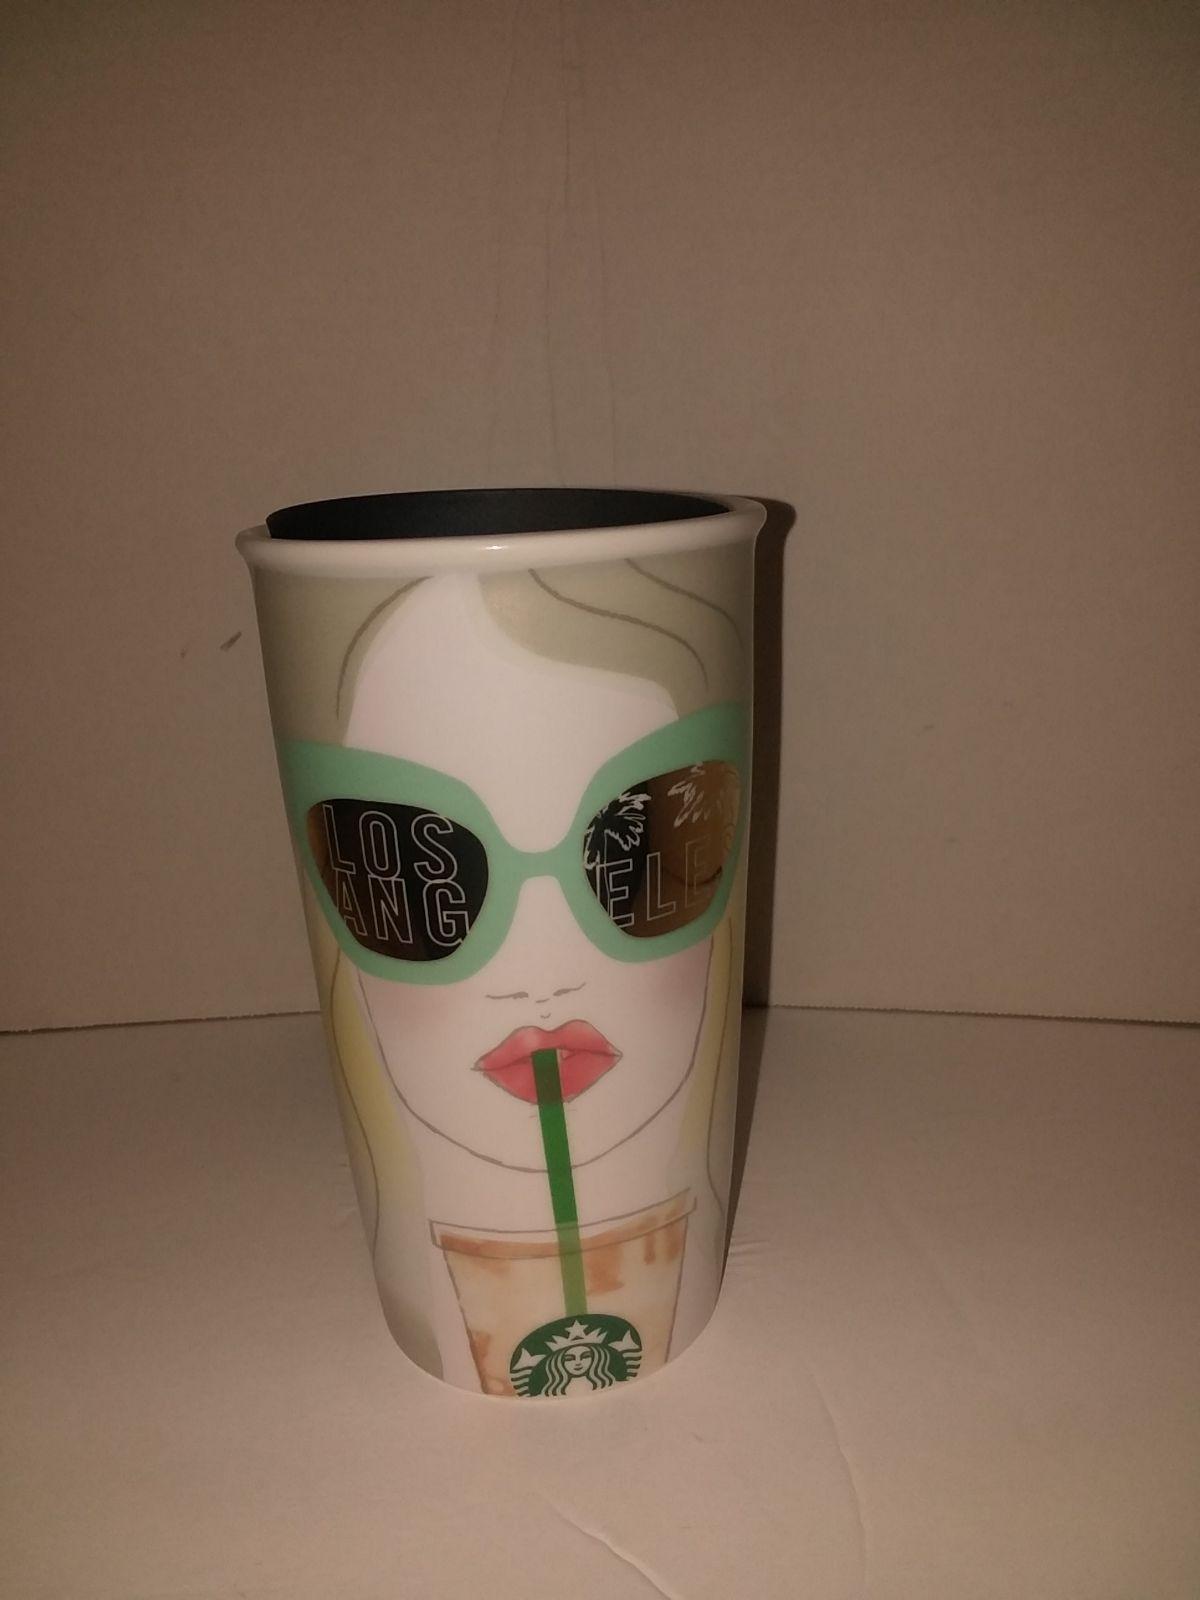 NEW 2016 Starbucks Los Angeles Double Wall Traveler Ceramic Tumbler 12oz